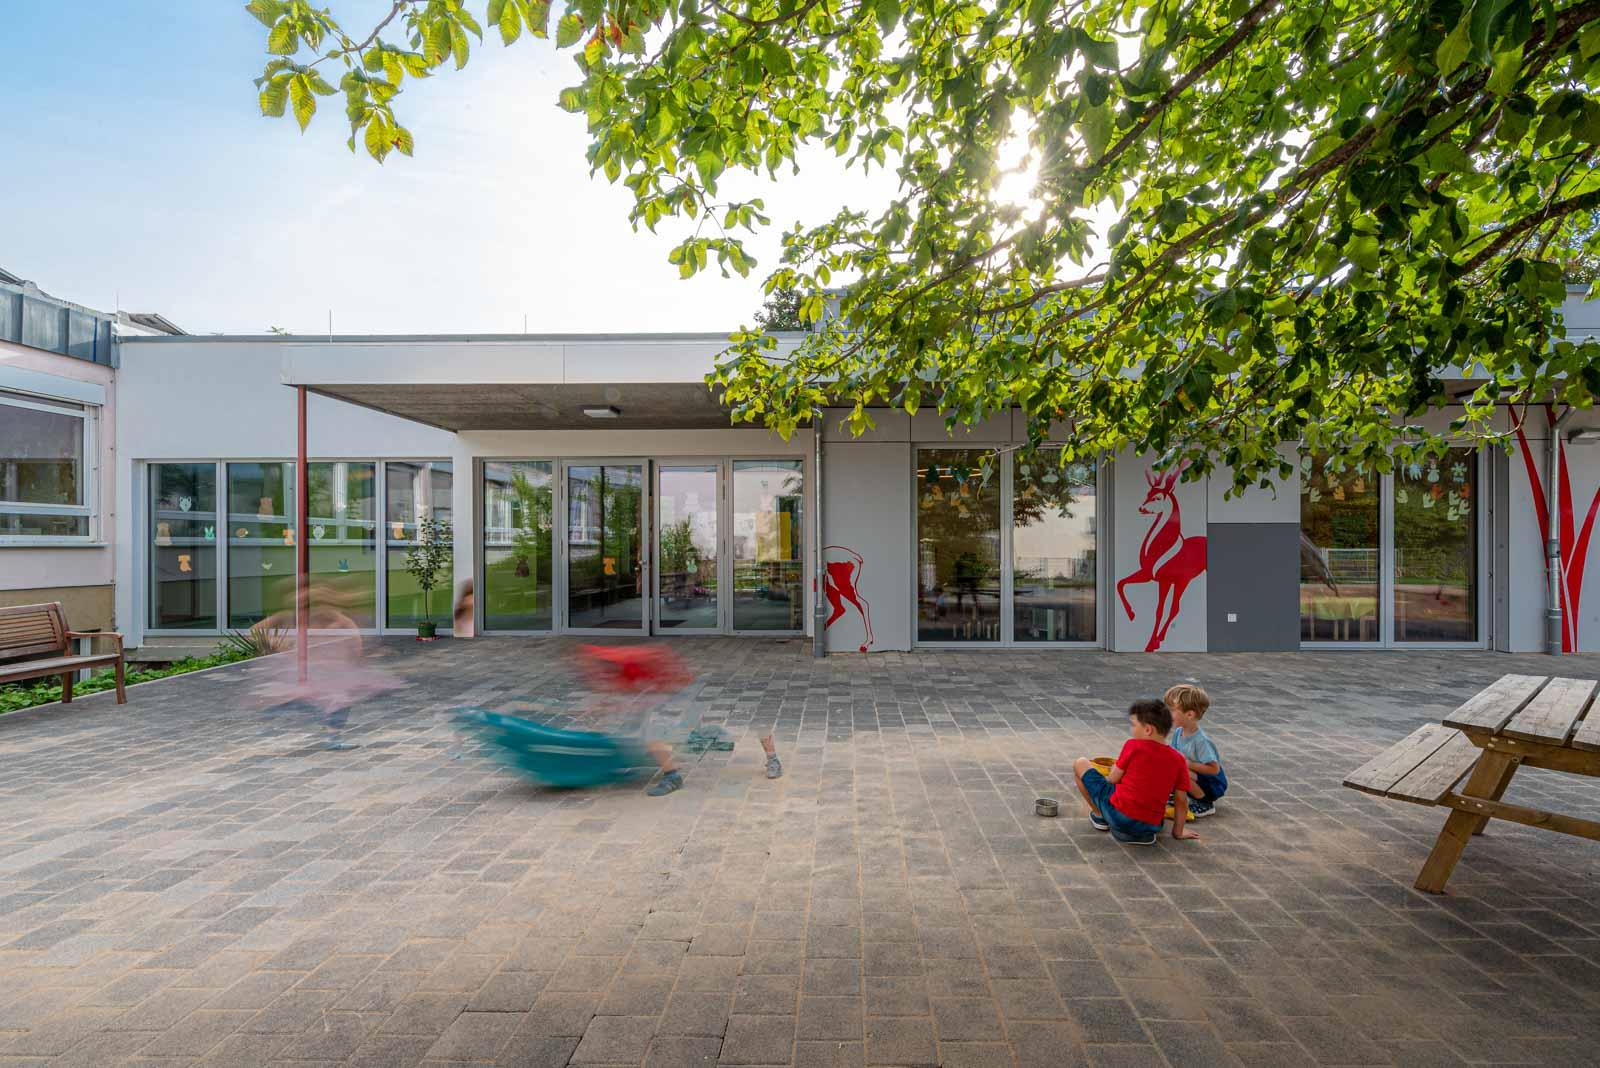 Evangelischer Kindergarten Tauberbischofsheim